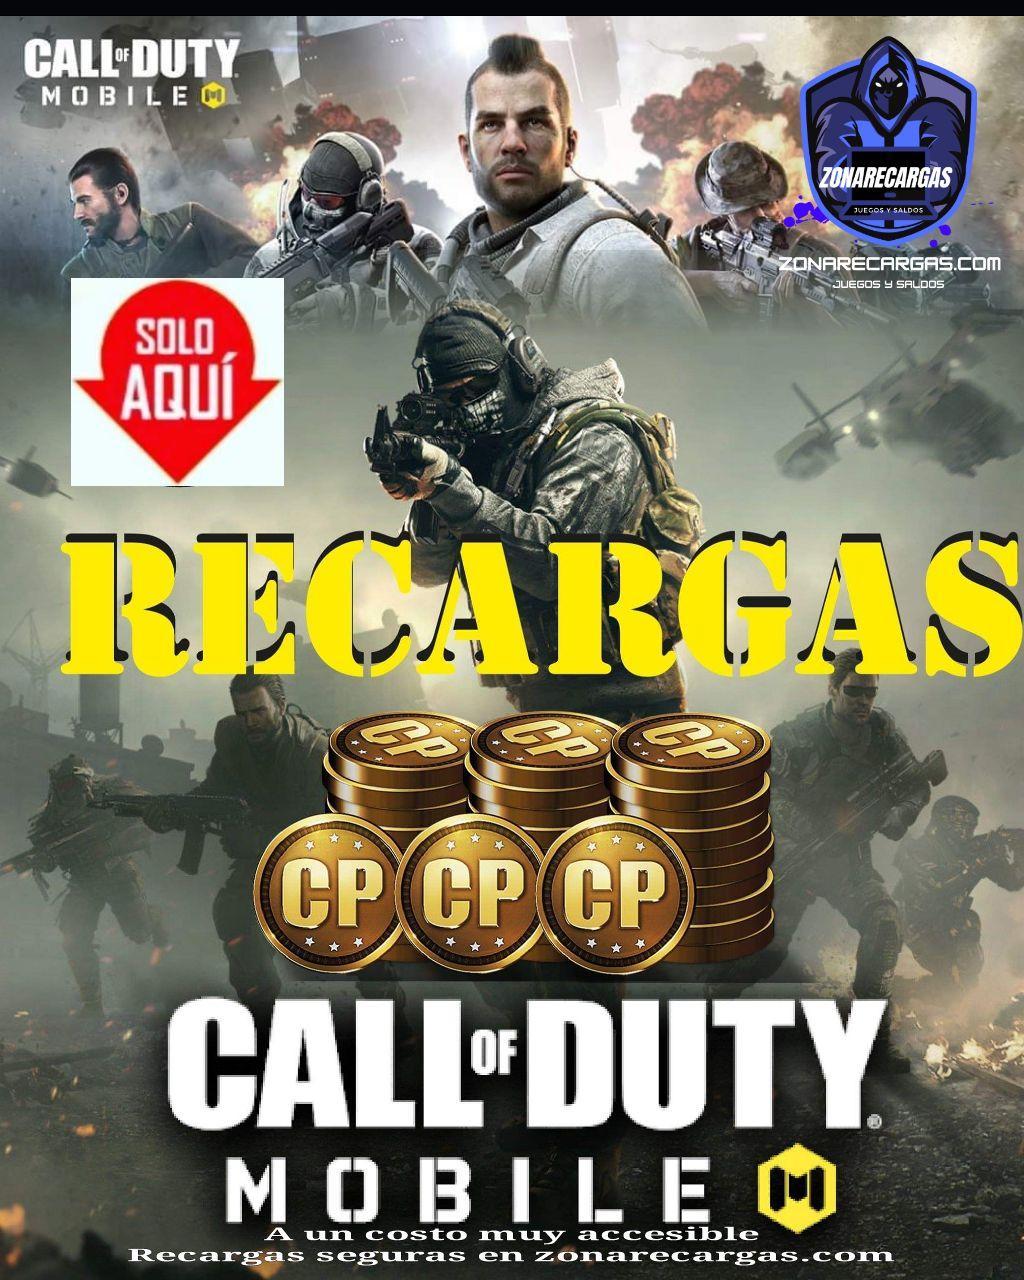 recargas call of dutty